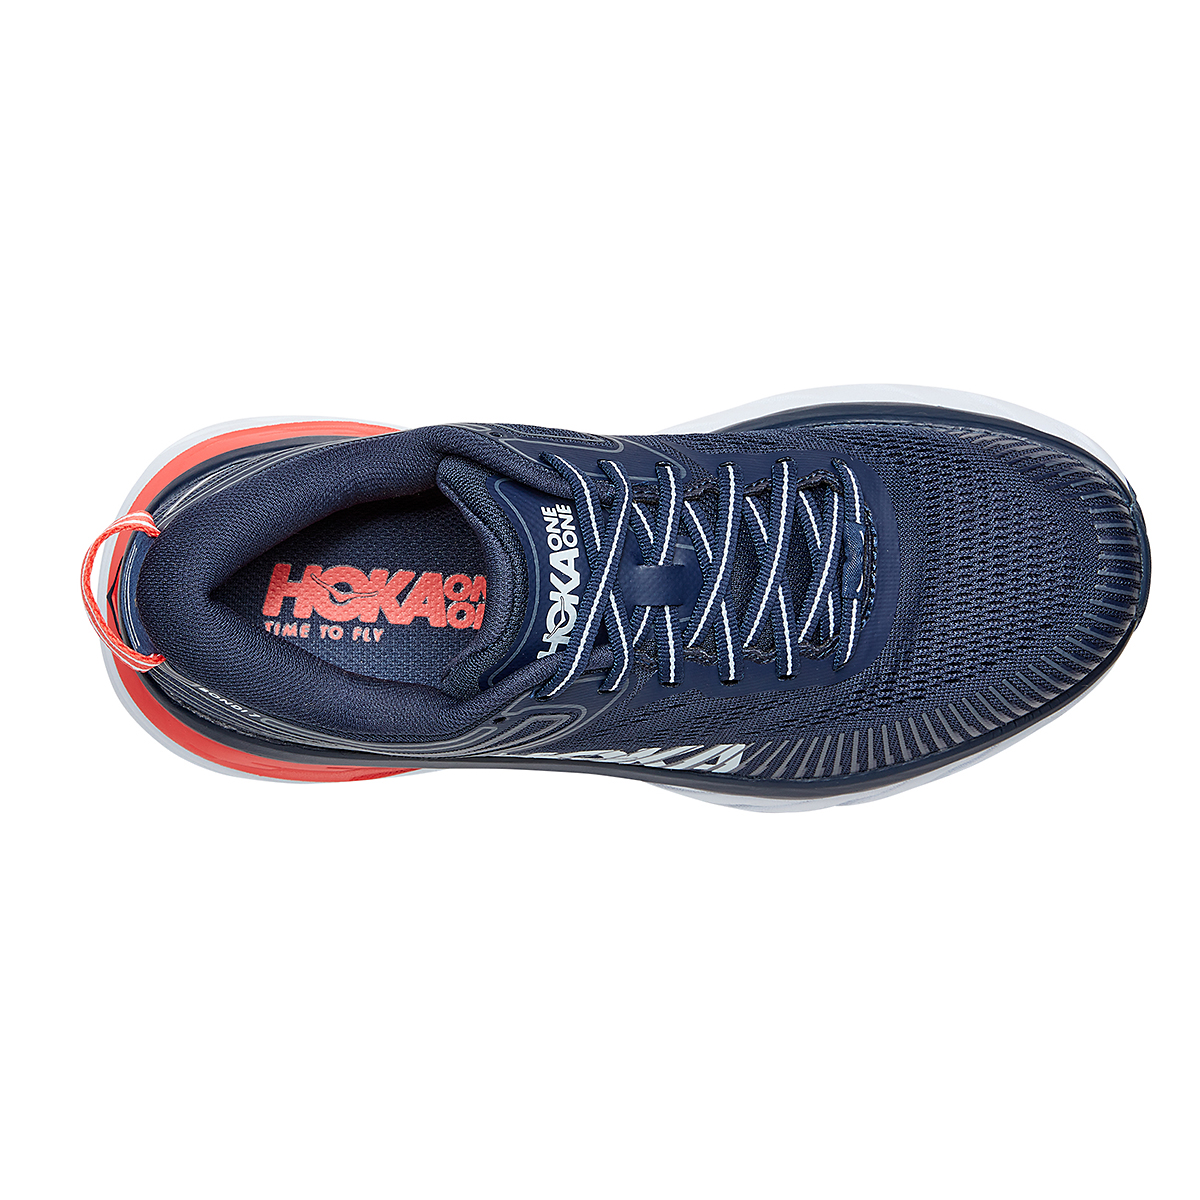 Women's Hoka One One Bondi 7 Running Shoe - Color: Black Iris/Ballad Blue - Size: 6 - Width: Regular, Black Iris/Ballad Blue, large, image 5